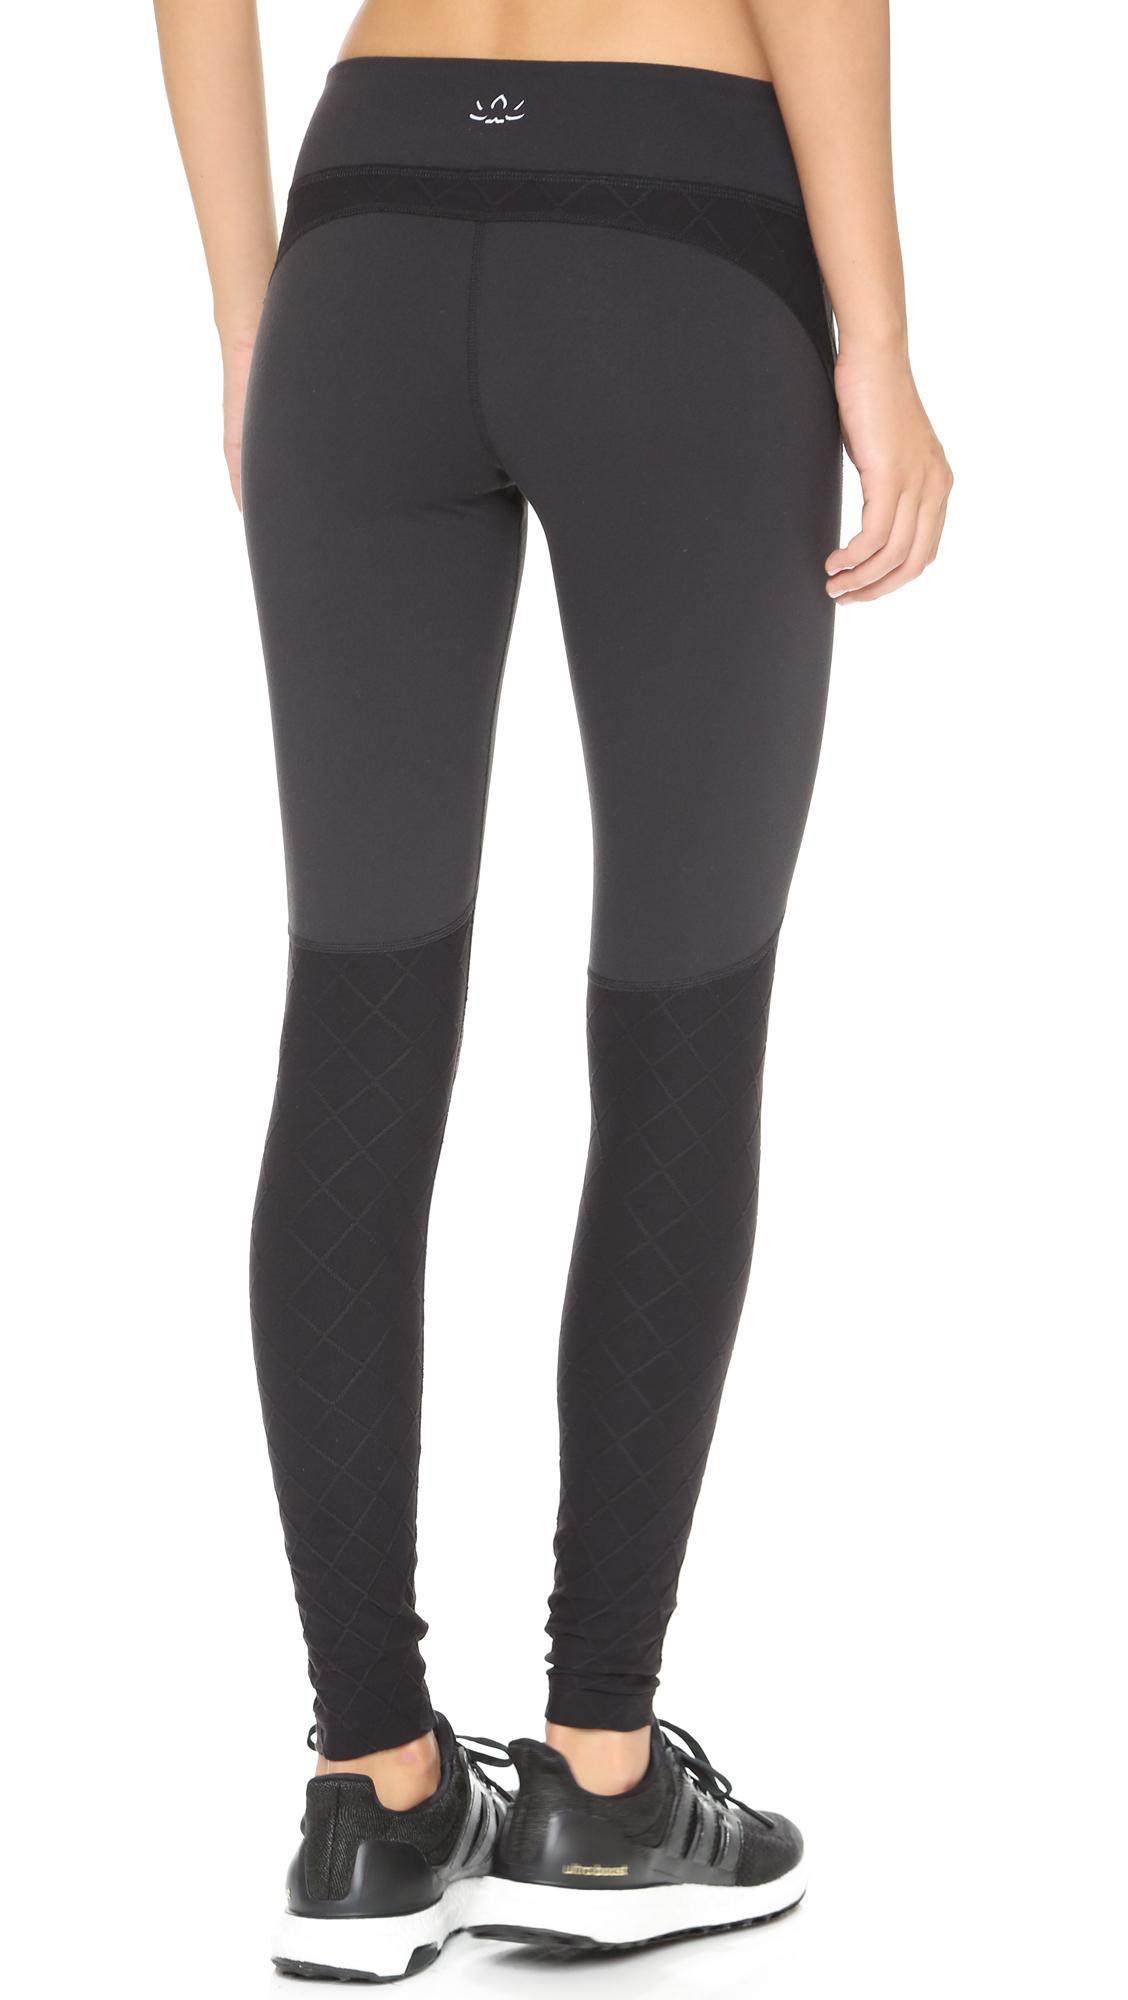 b45f95d83280b Beyond Yoga Quilted Paneled Leggings - Black in Black - Lyst